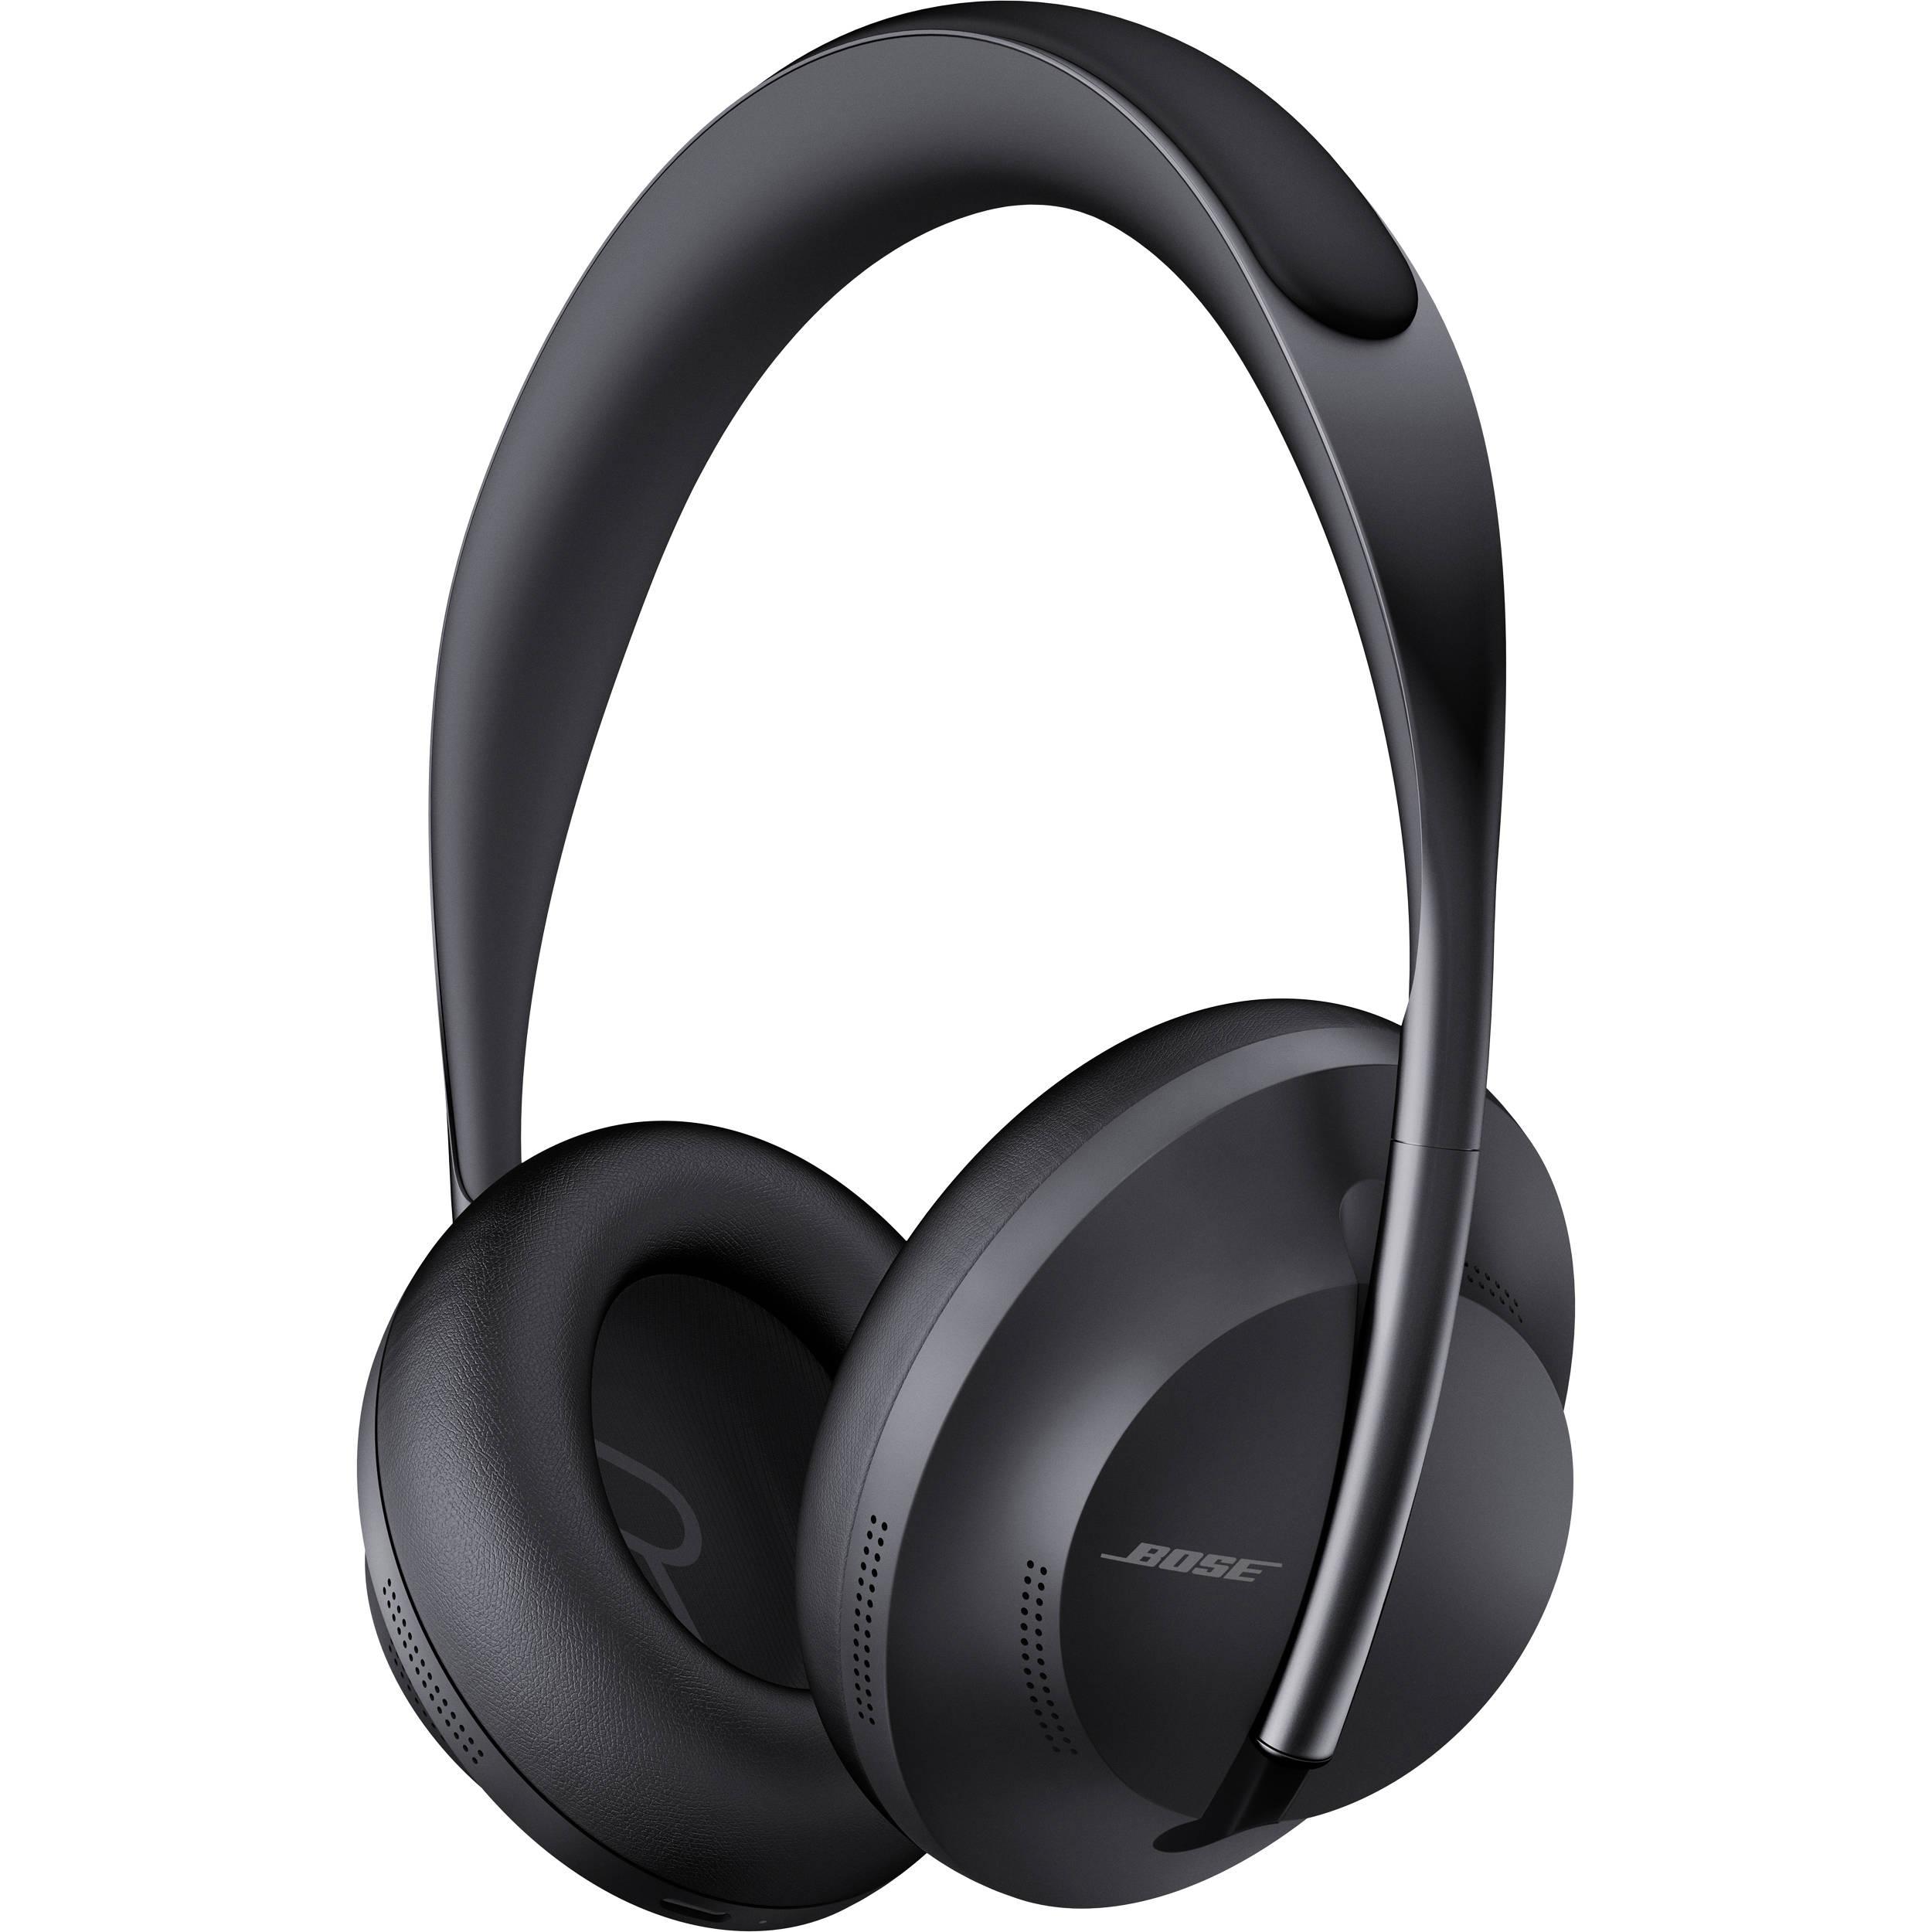 Bose Headphones 700 Noise-Canceling Bluetooth Headphones